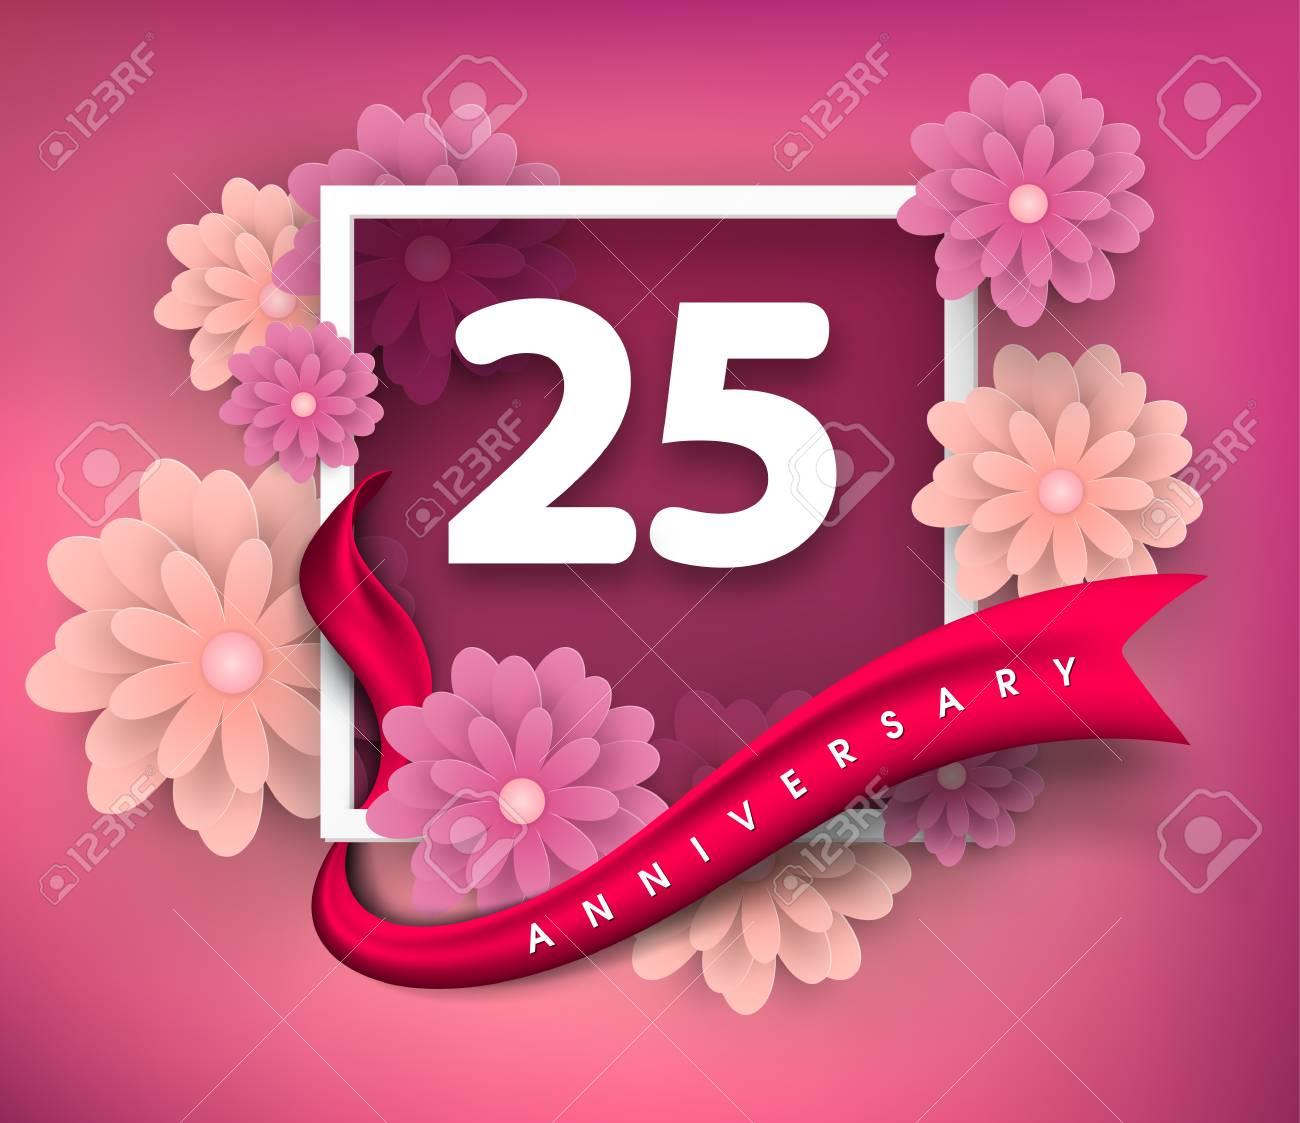 25 anniversary invitation card royalty free cliparts vectors and 25 anniversary invitation card stock vector 73169470 stopboris Image collections